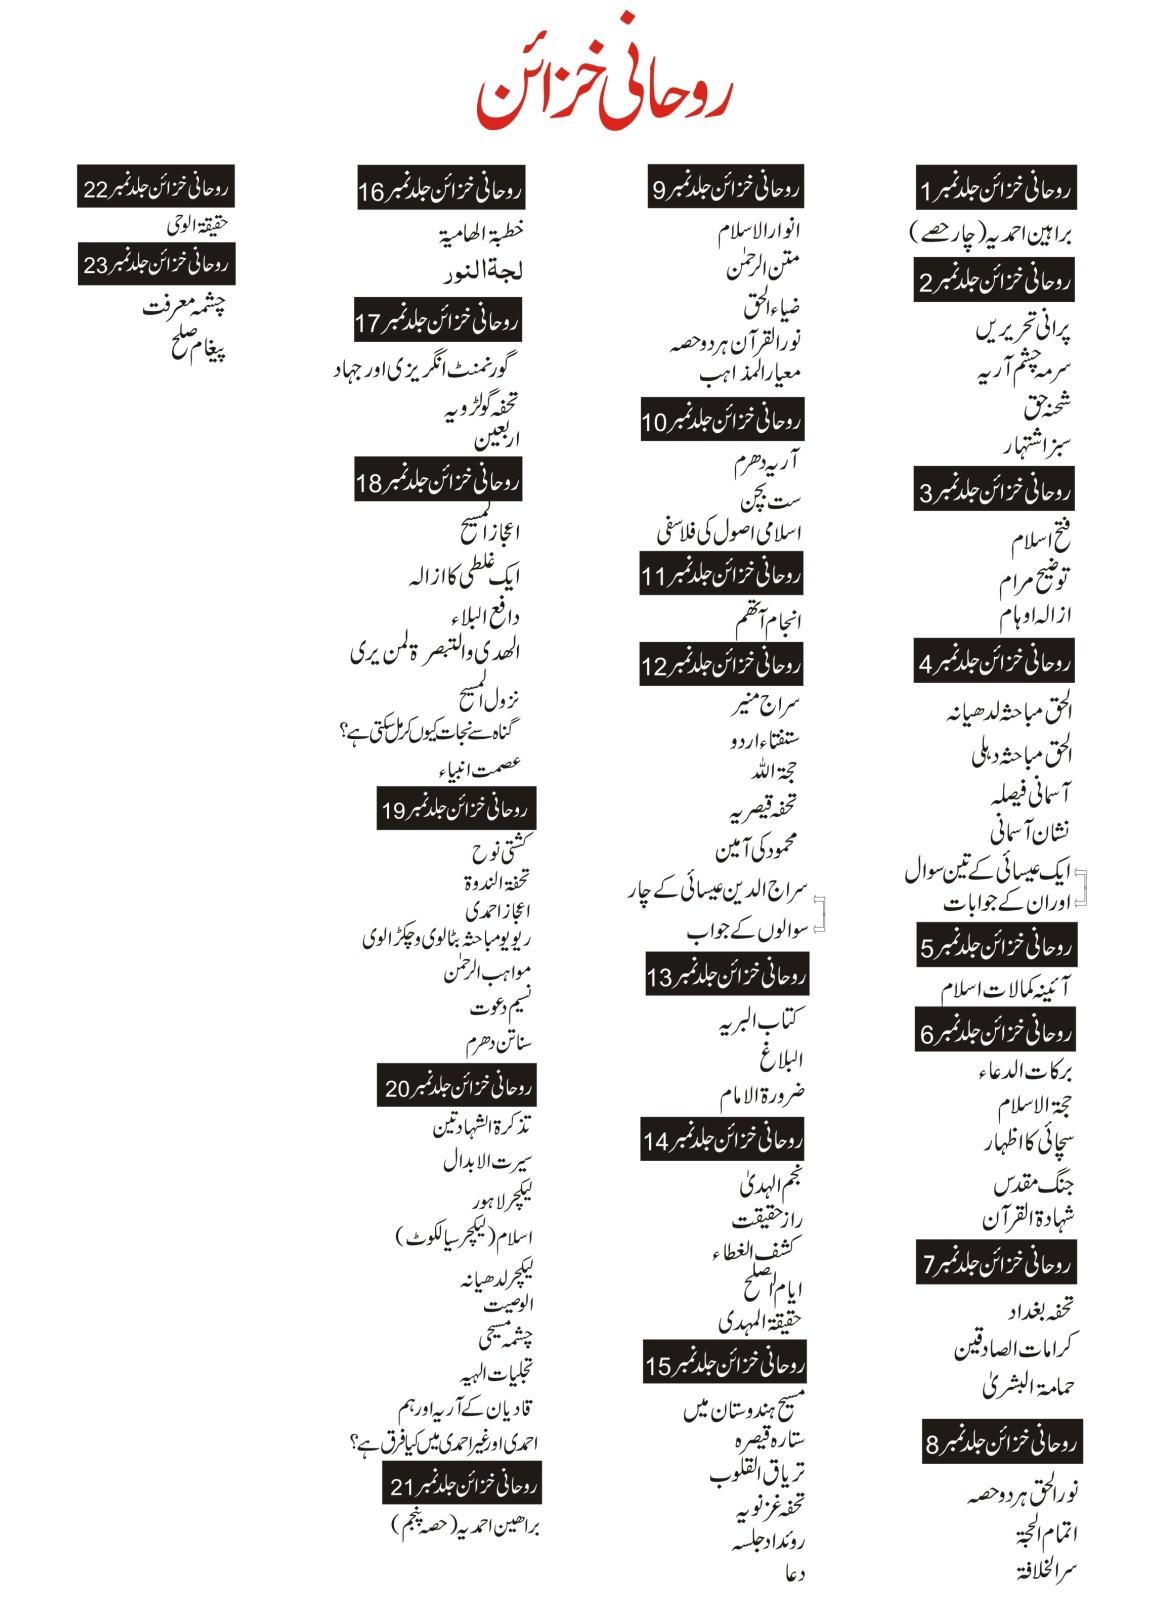 list-of-roohani-khazain-books : mindroastermir : Free